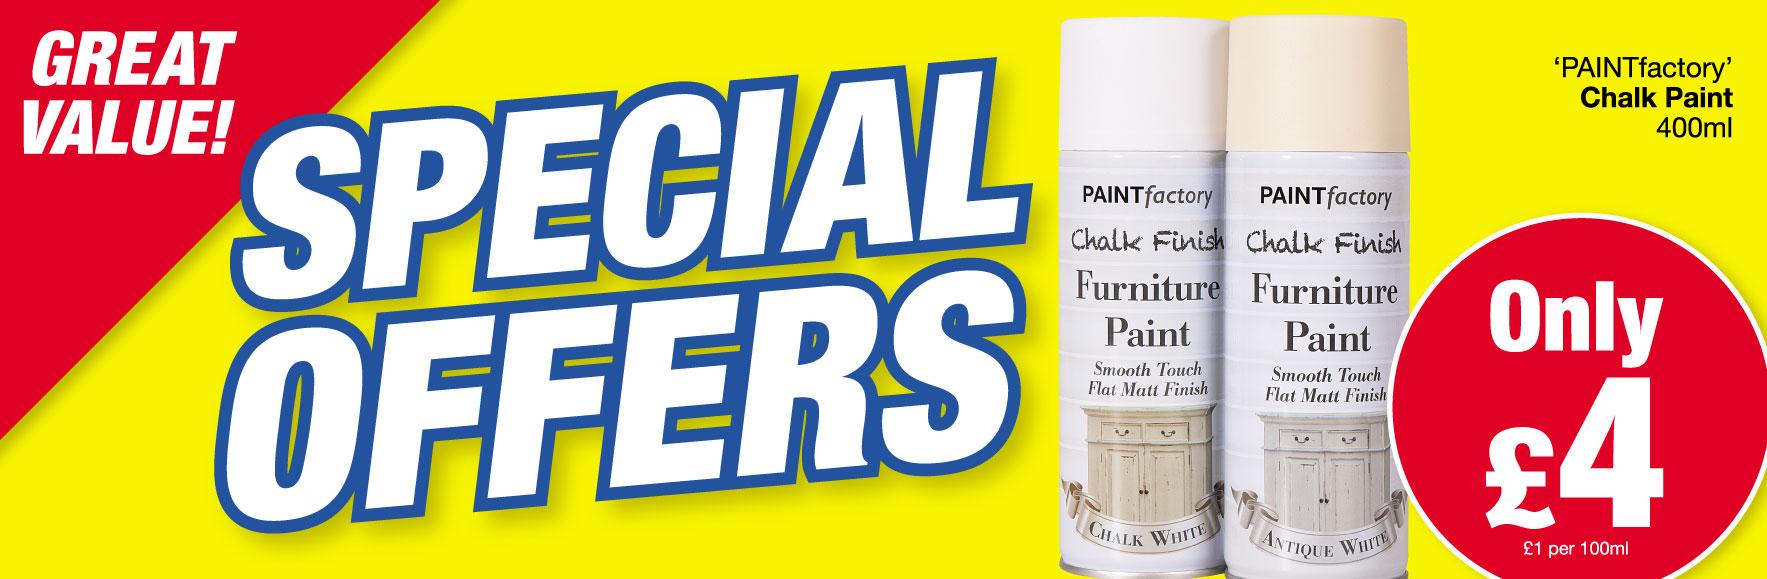 'Paint Factory' Chalk Paint. ONLY £4